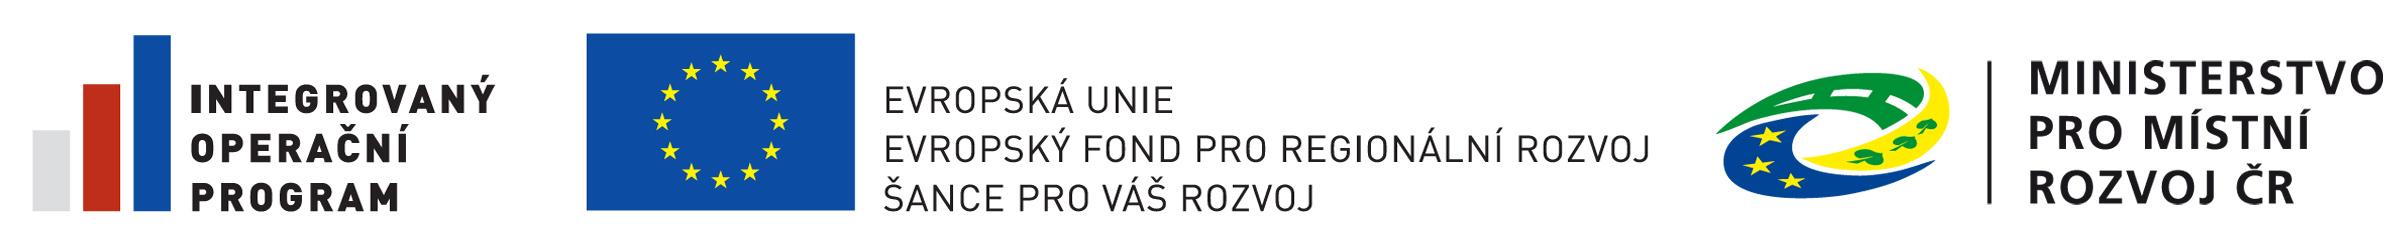 logo IOP   EU   MMR   1